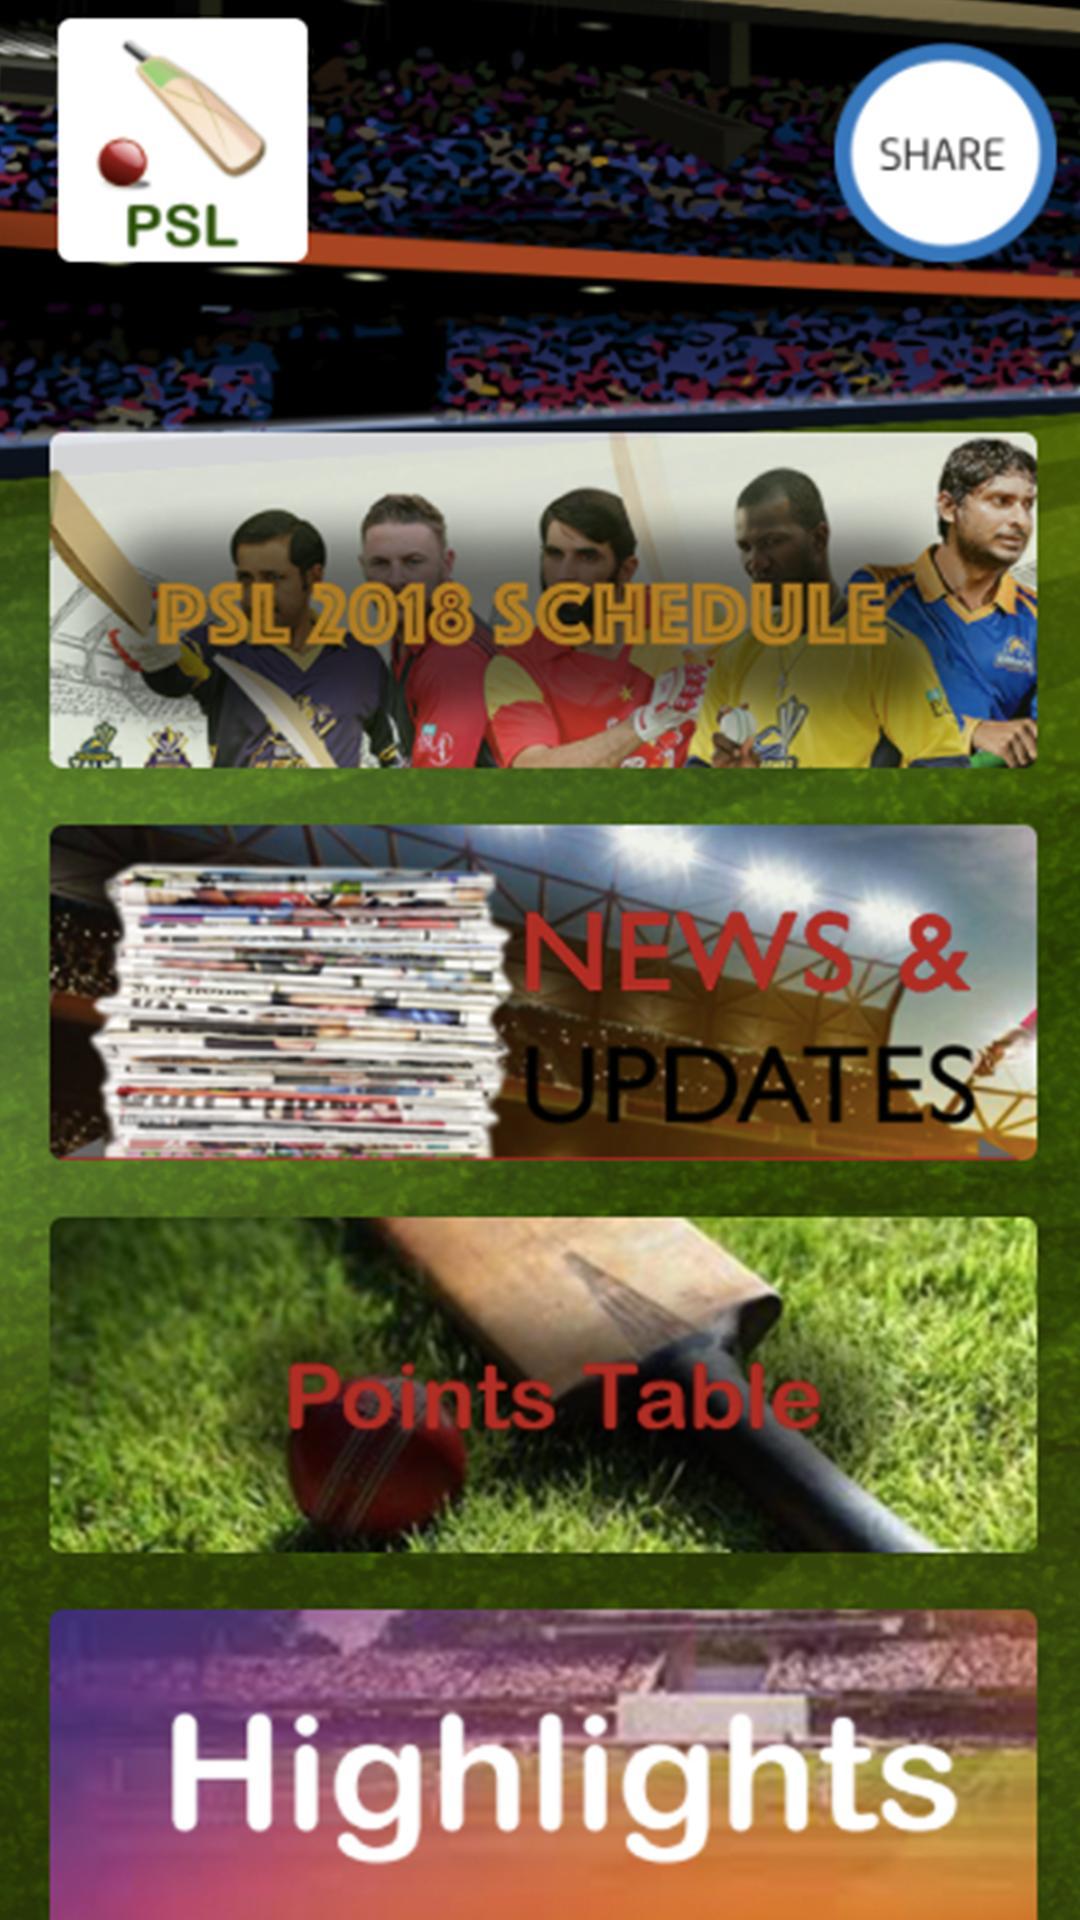 PSL Updates & Schedules poster